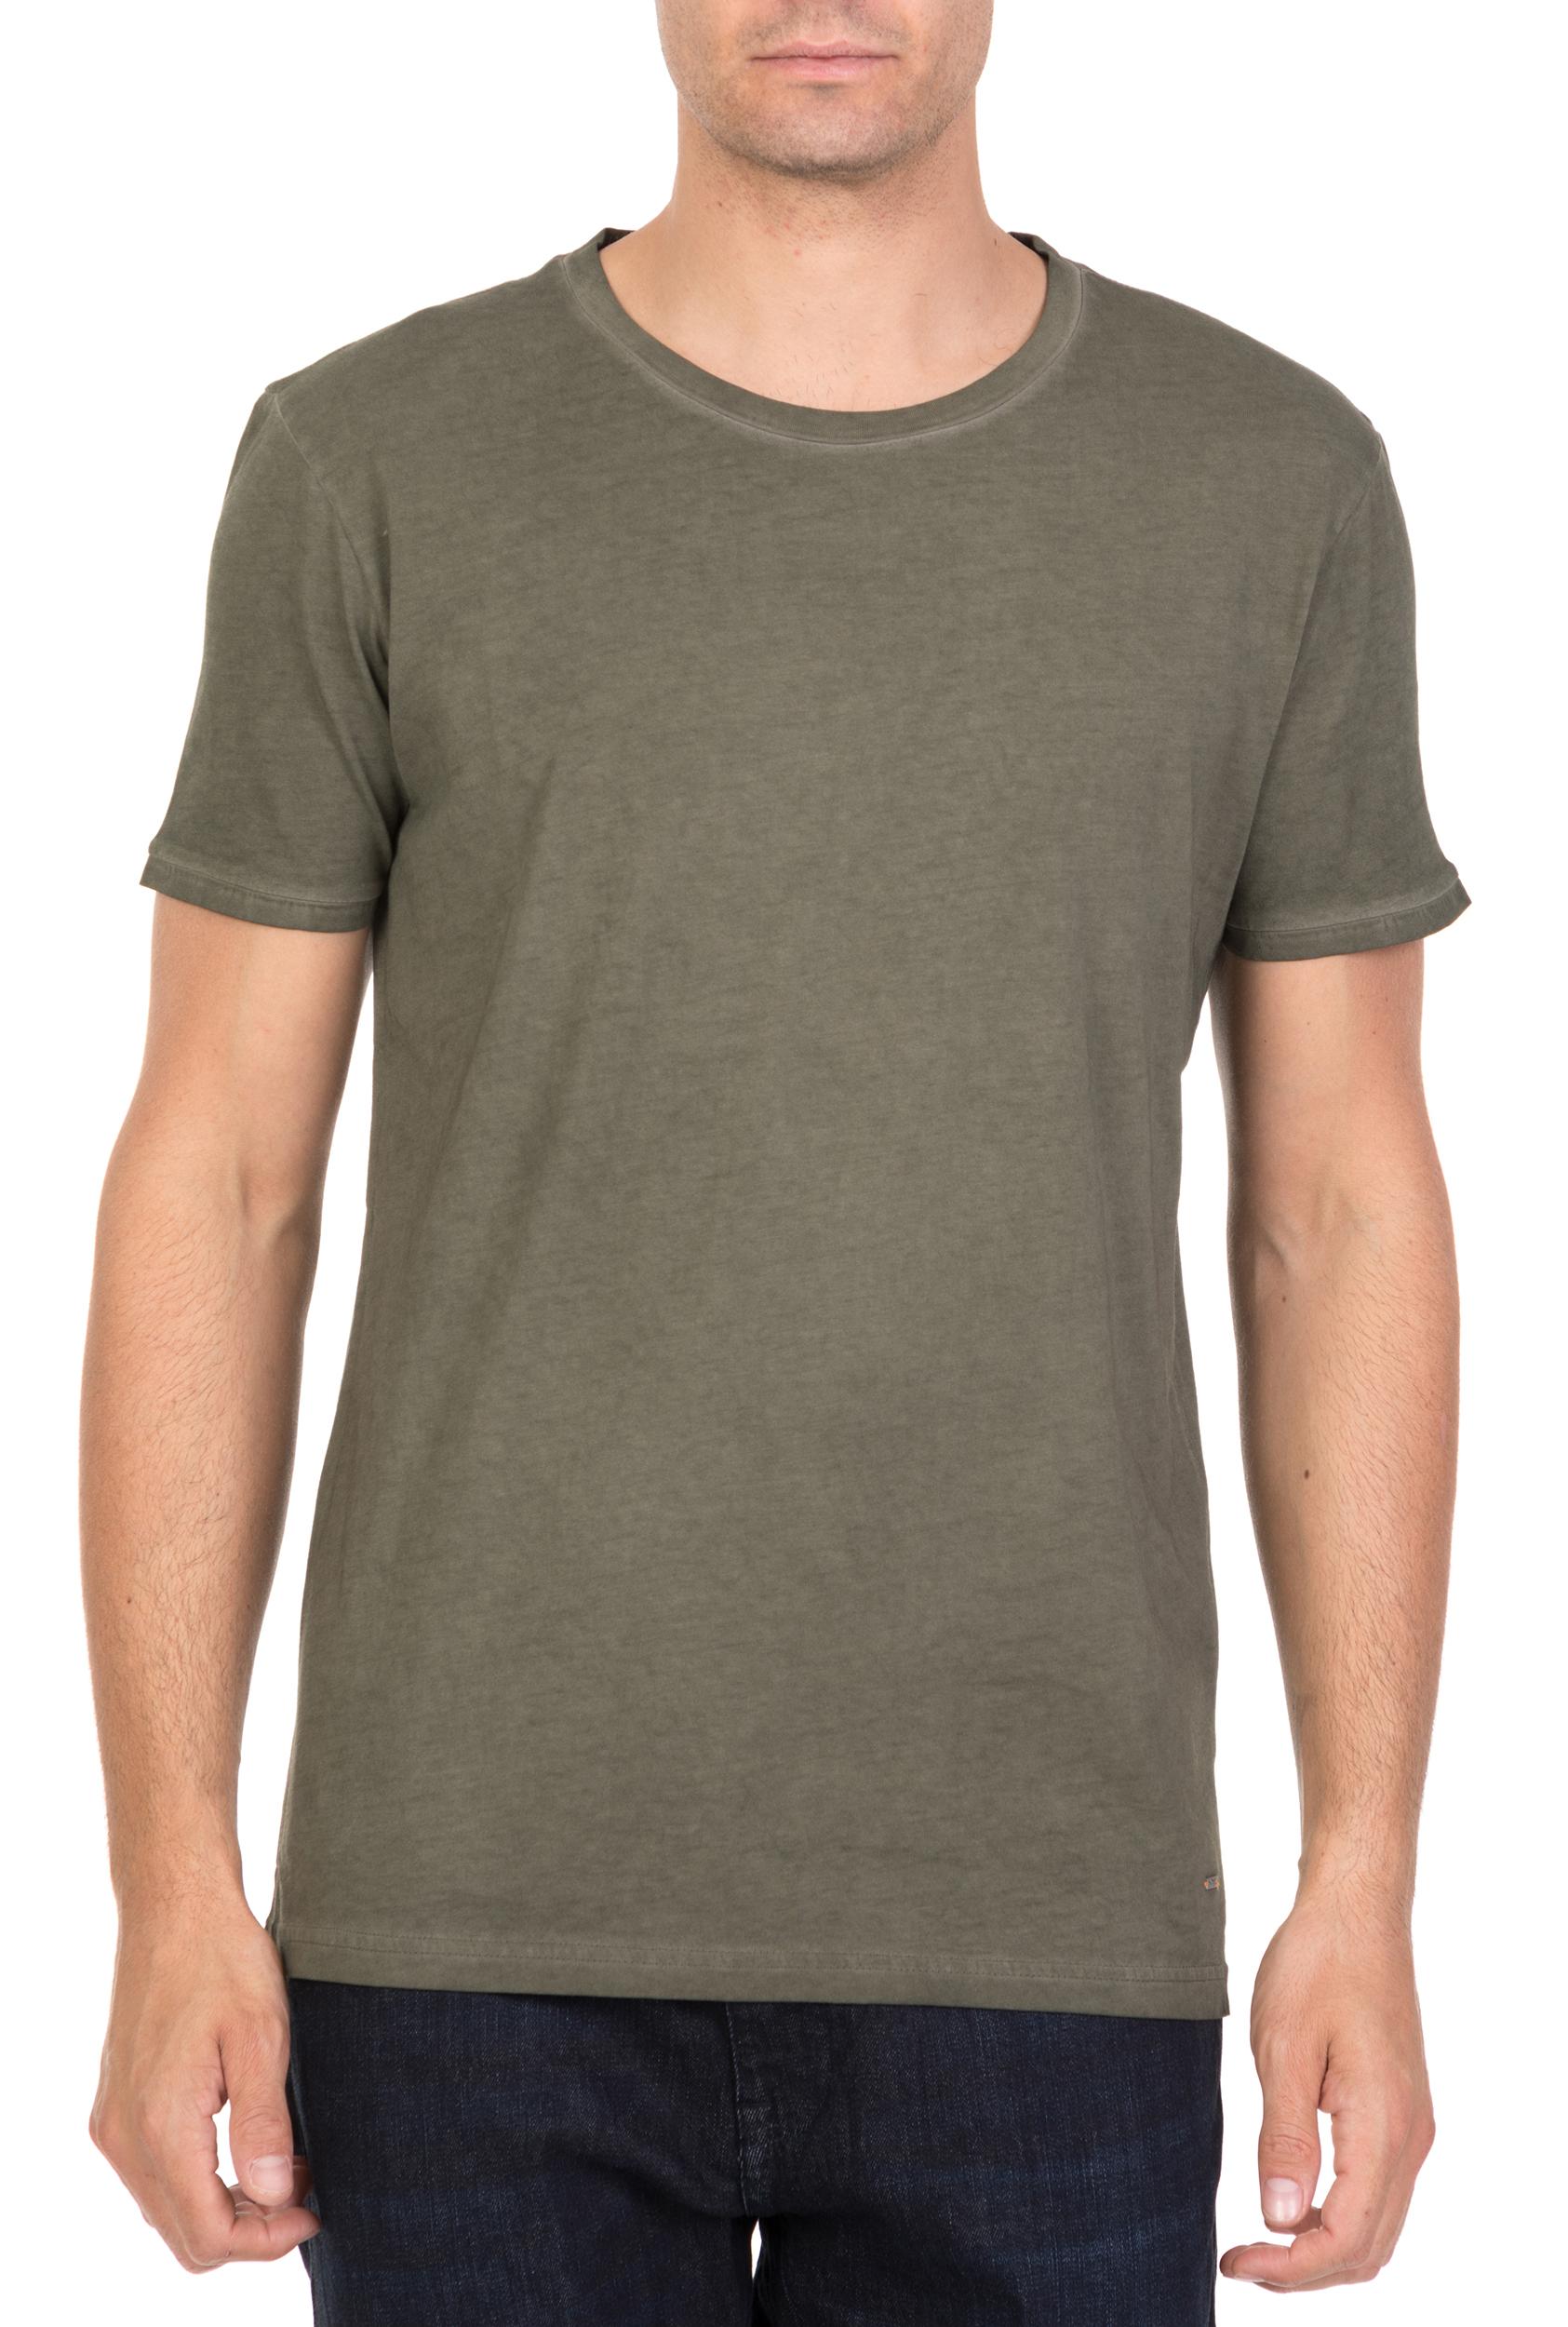 742b9235c331 CollectiveOnline BOSS - Ανδρική κοντομάνικη μπλούζα BOSS JERSEY Troy λαδί